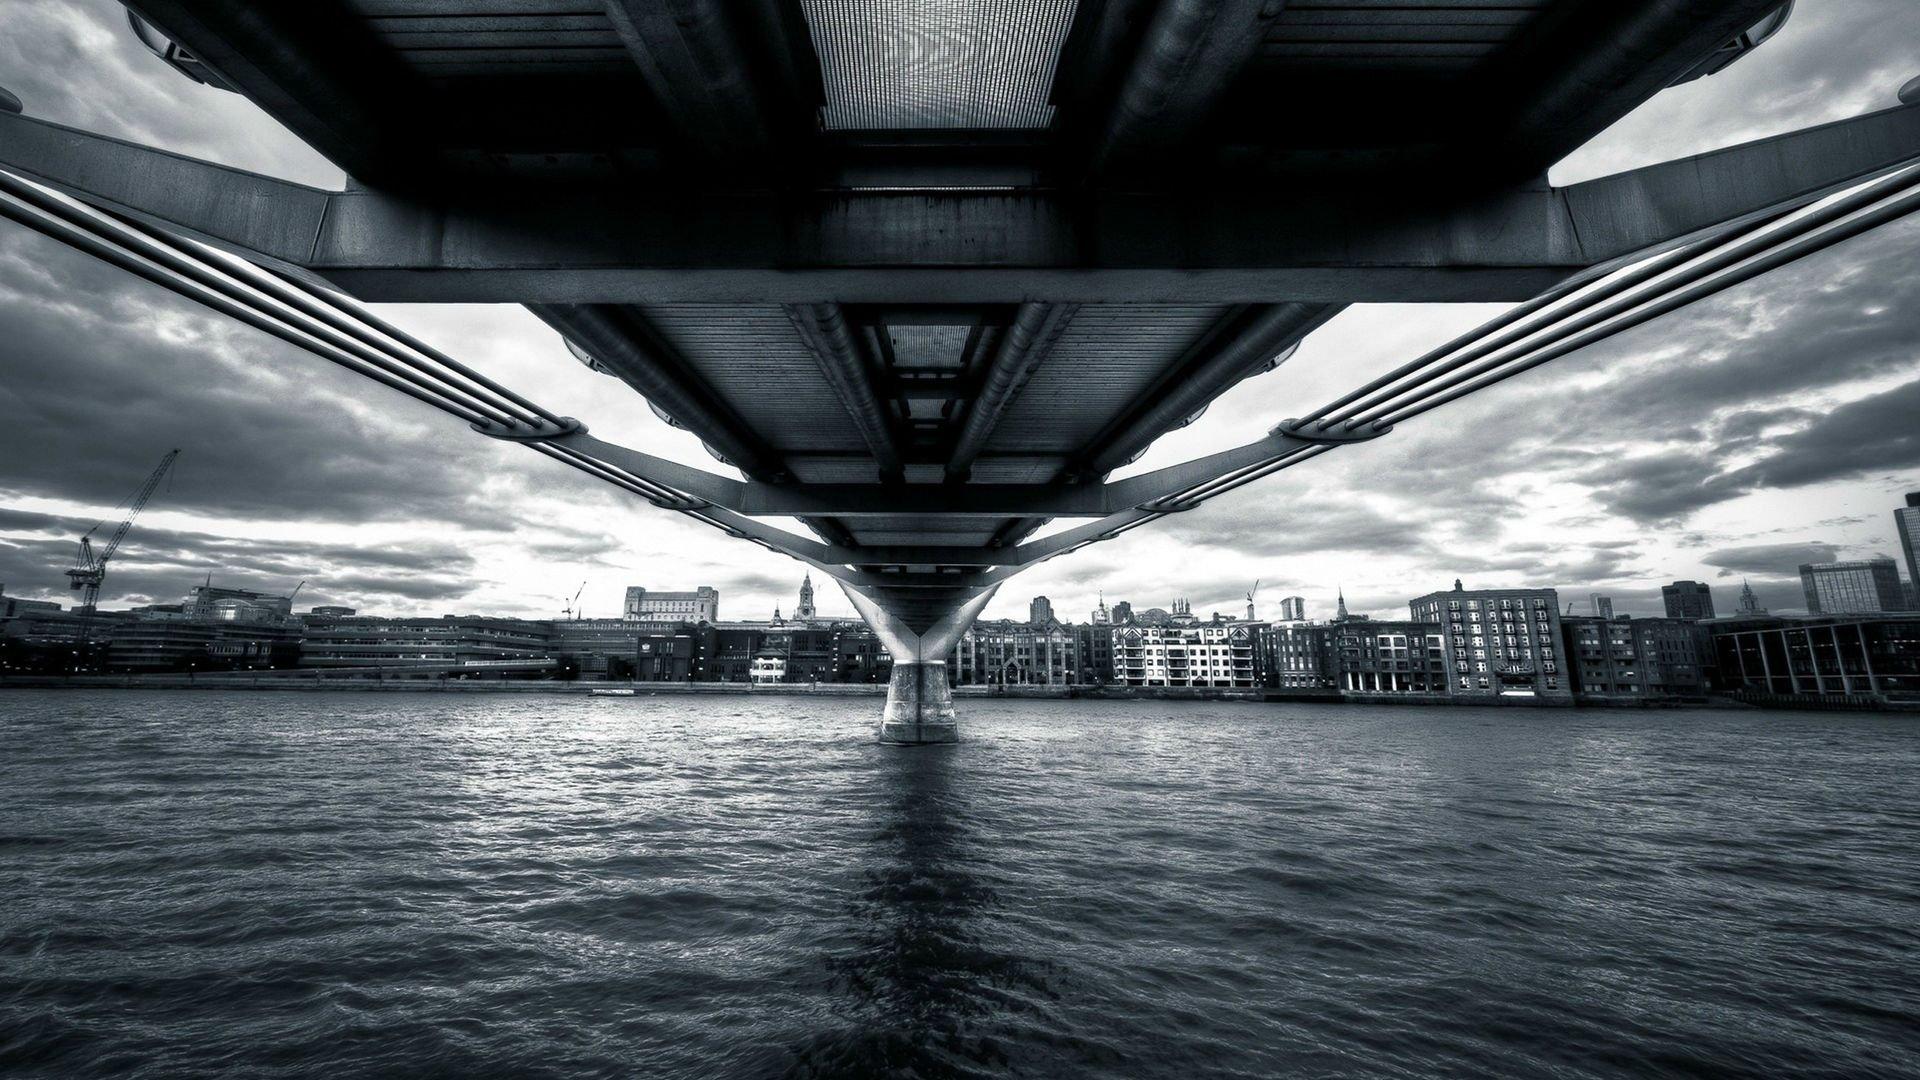 Black And White Bridge Hd Wallpaper